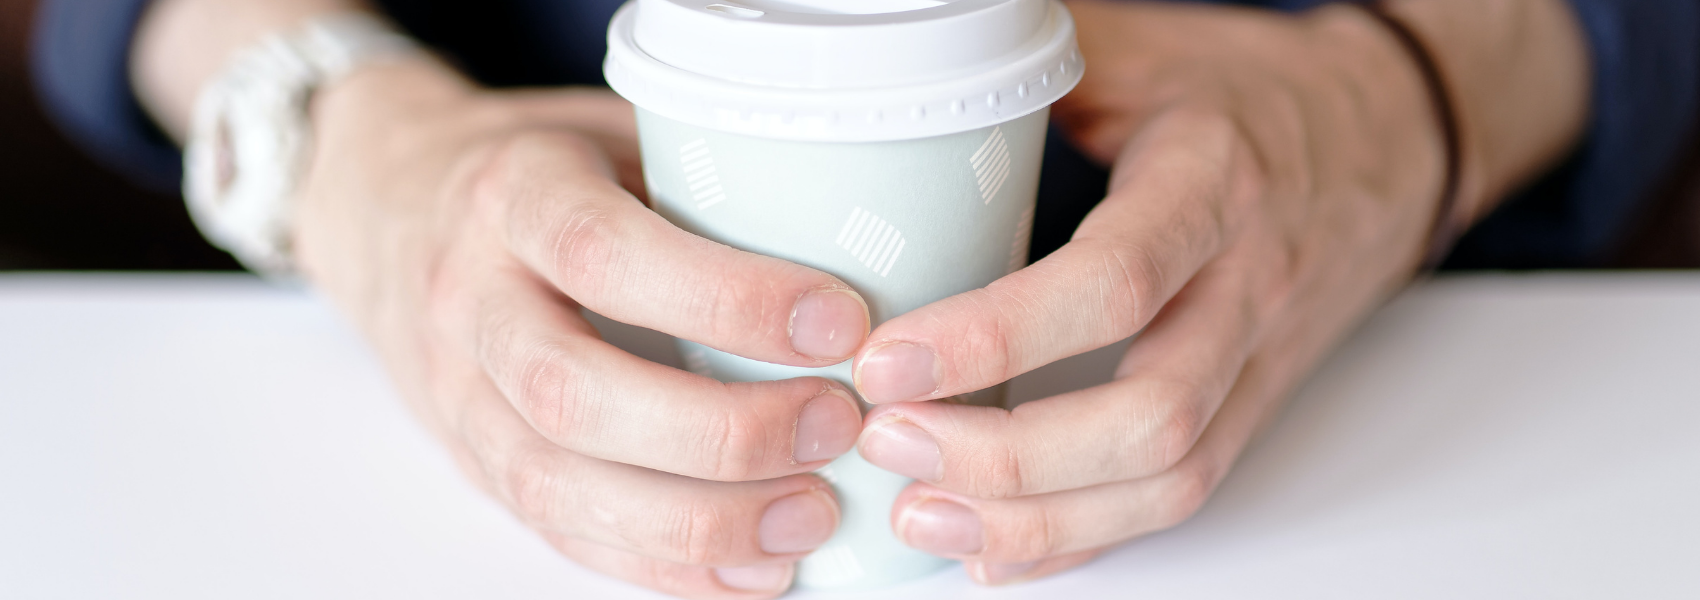 O melanoma, o tipo mais grave de cancro da pele, pode também surgir nas unhas